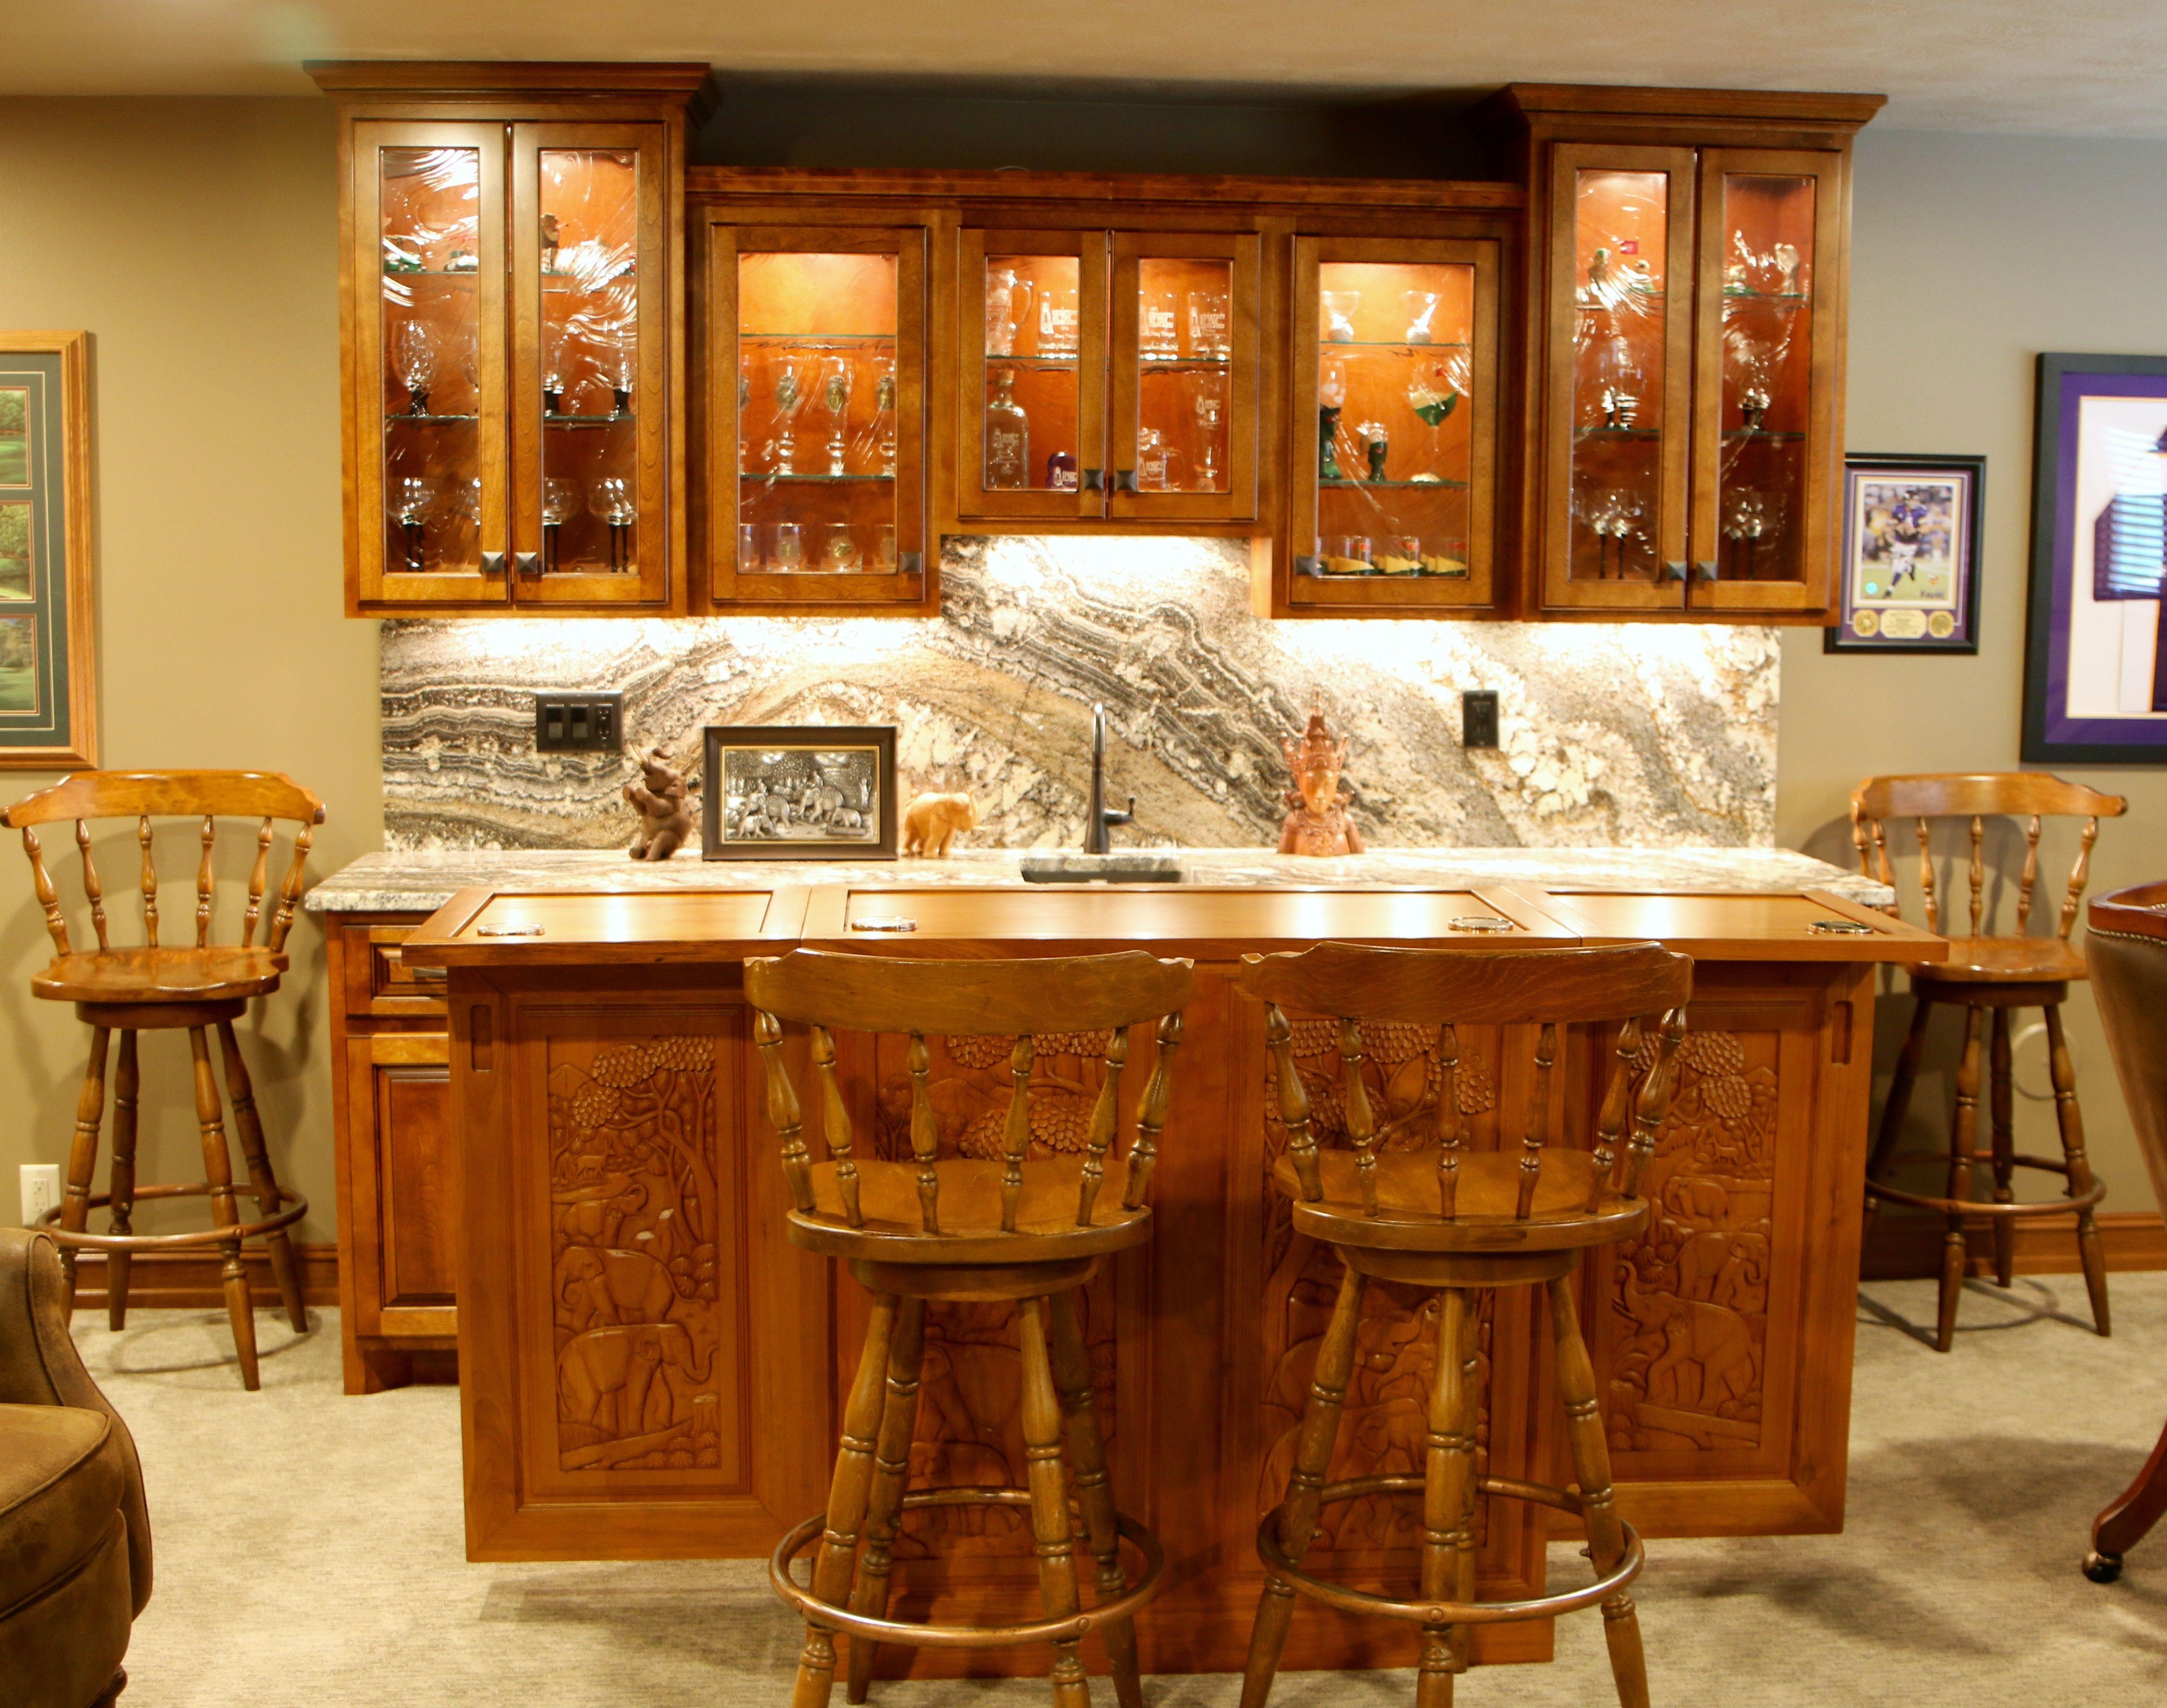 Sioux Falls Kitchen Bath Siouxfallskitchenandbath Profile Pinterest